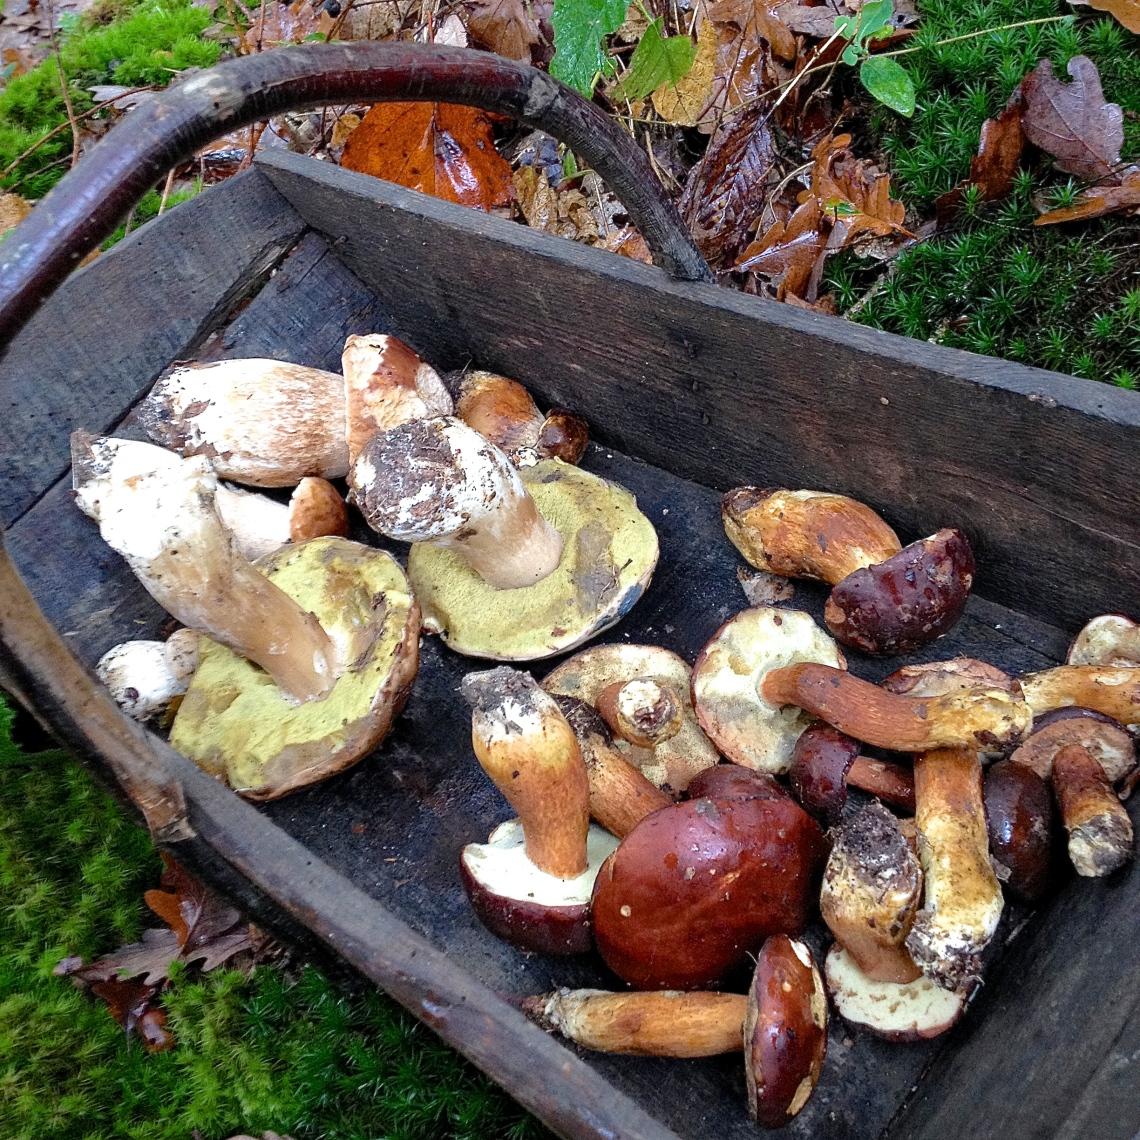 Cueillette sauvage champignon 23